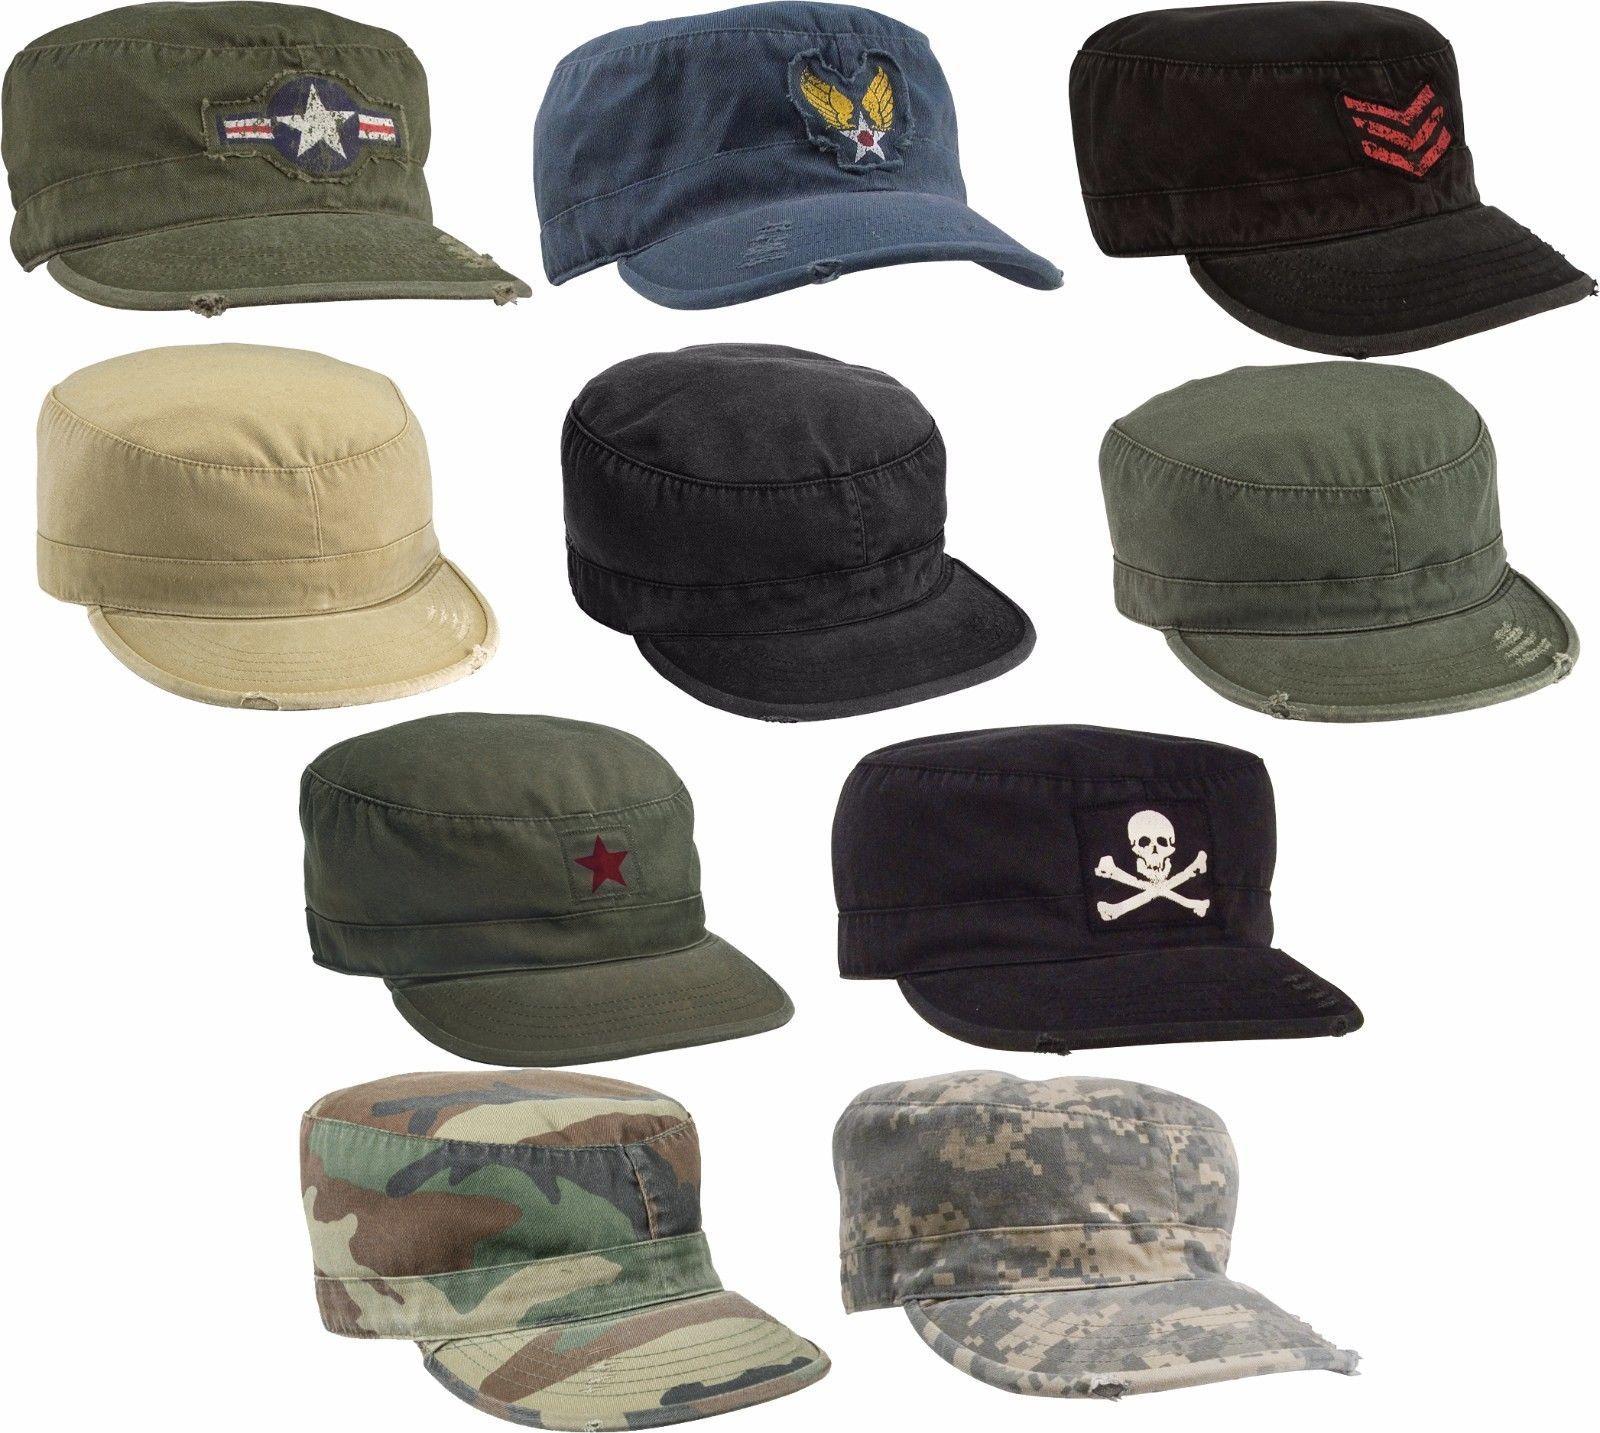 Vintage Us Army Patrol Cap Military Fatigue Hat  78f933ae473